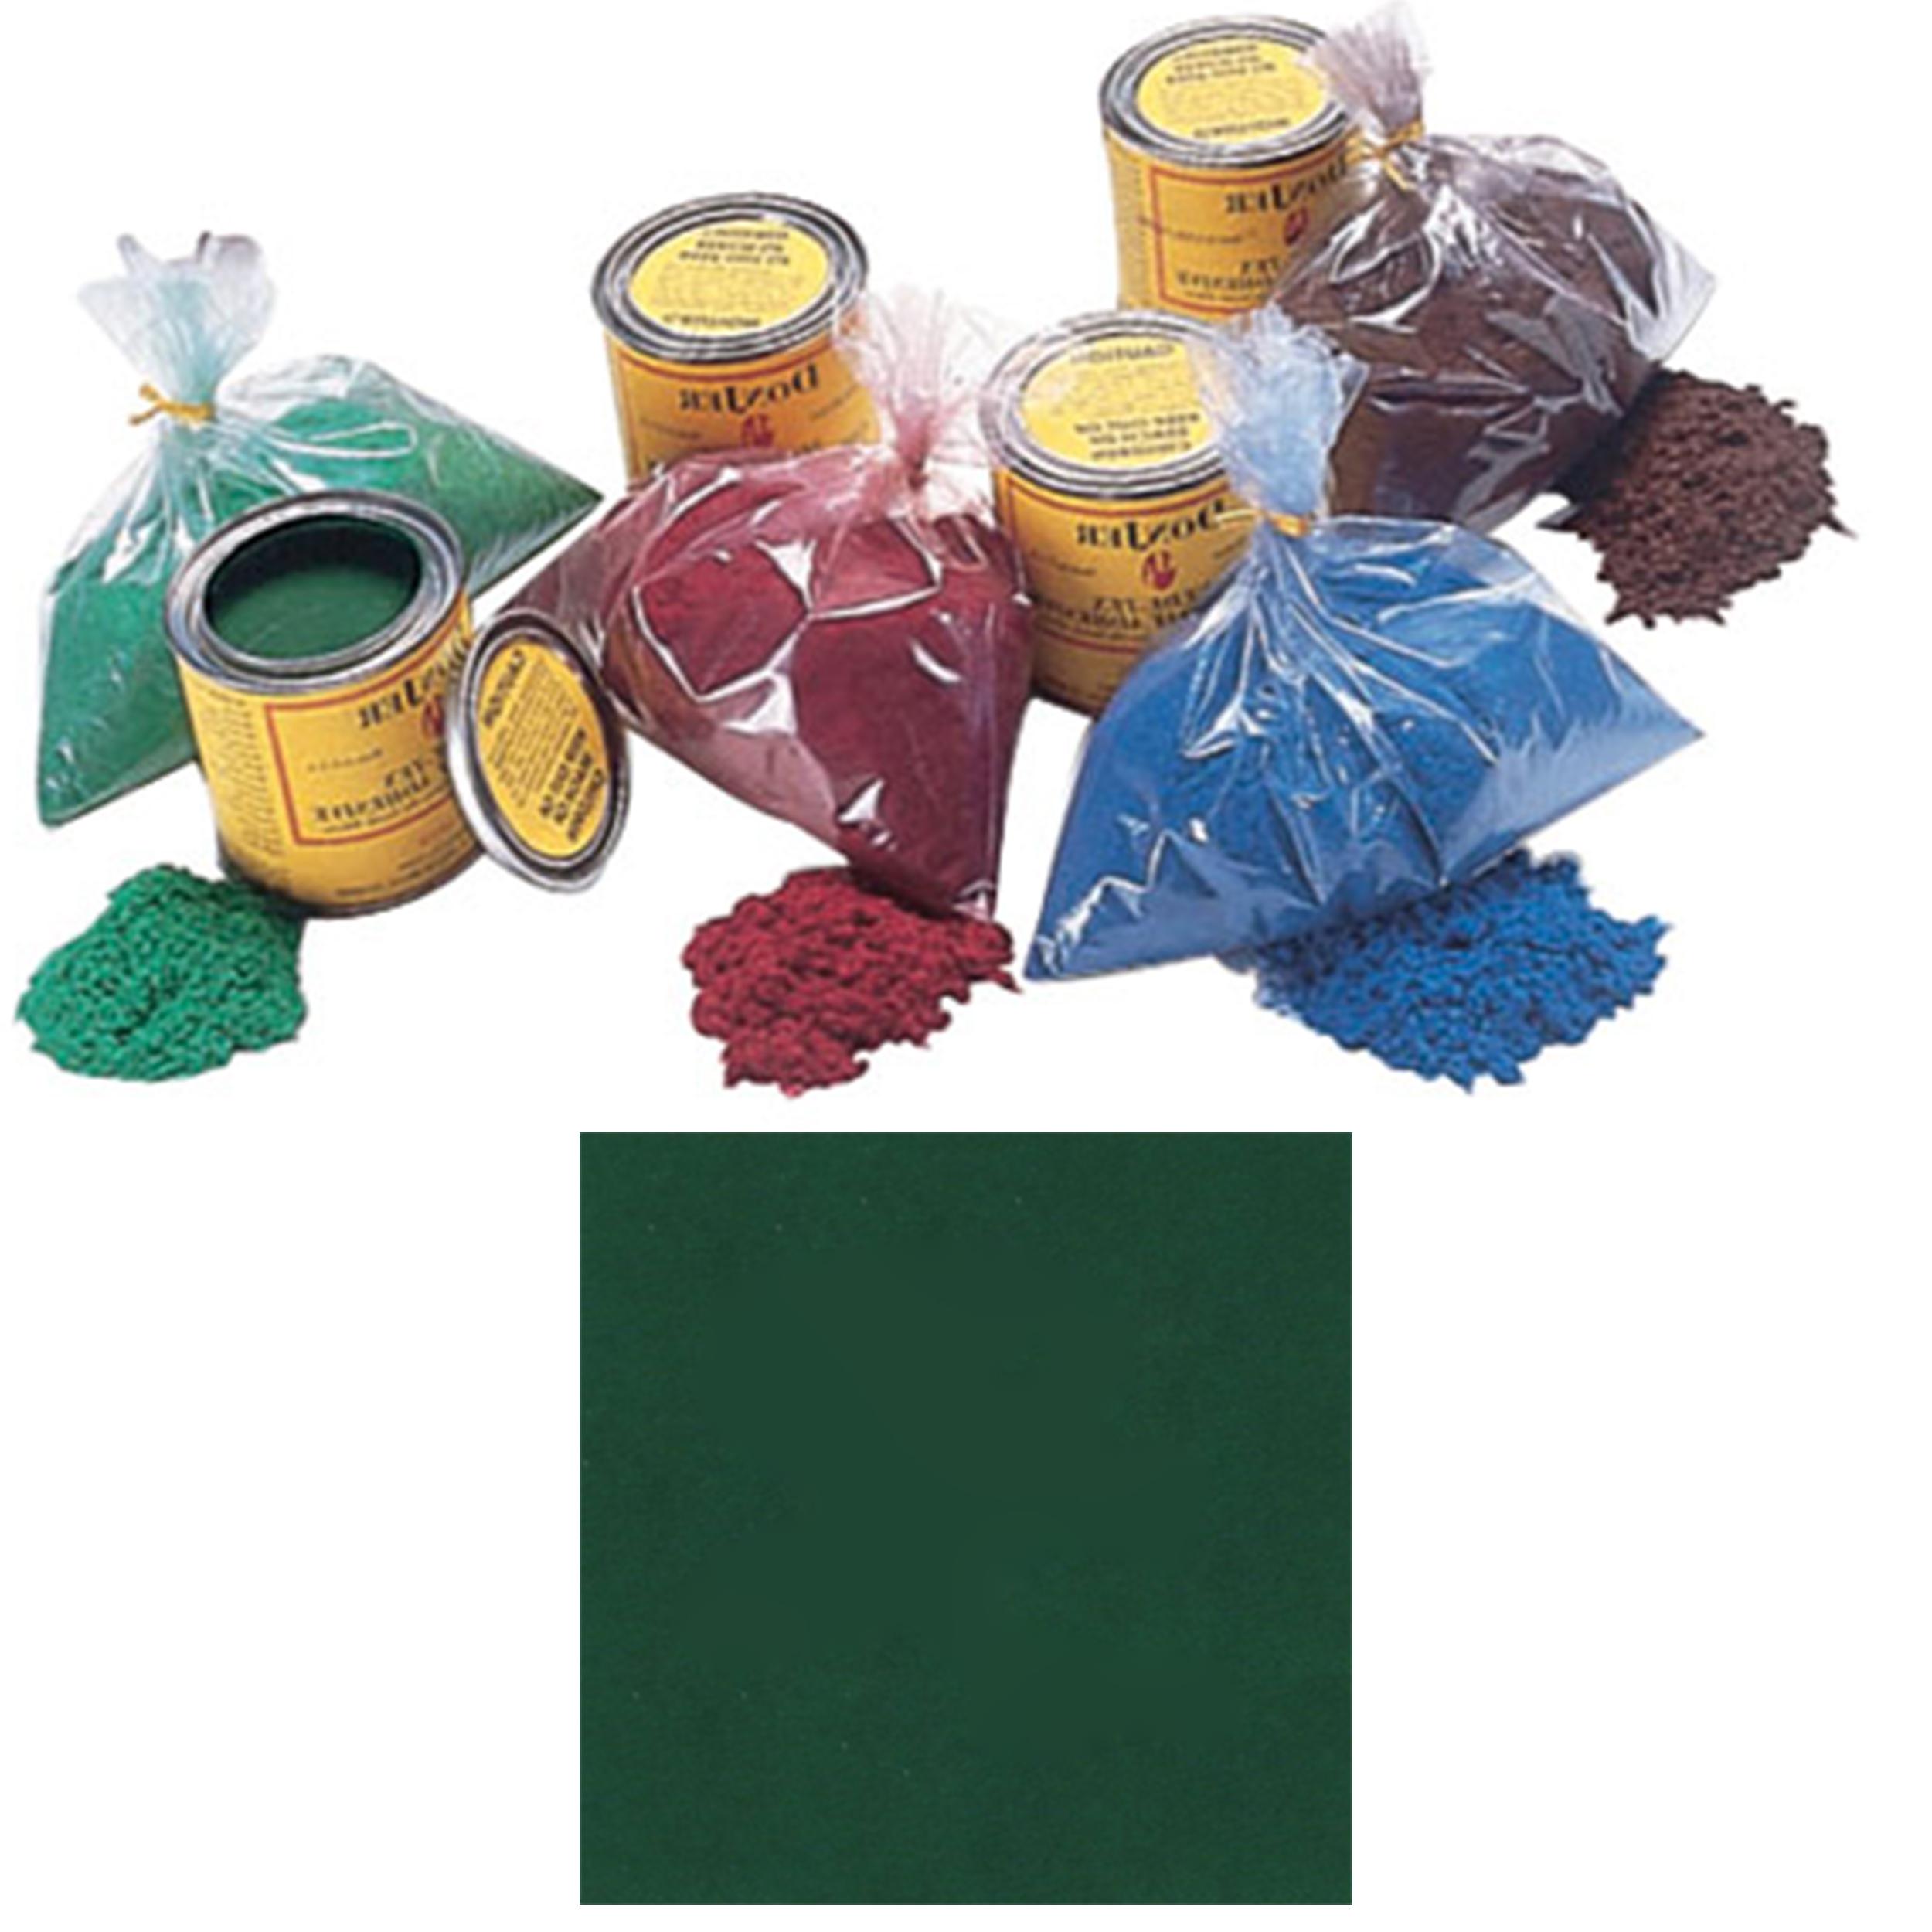 Kelly Green Flocking  Adhesive 8 oz